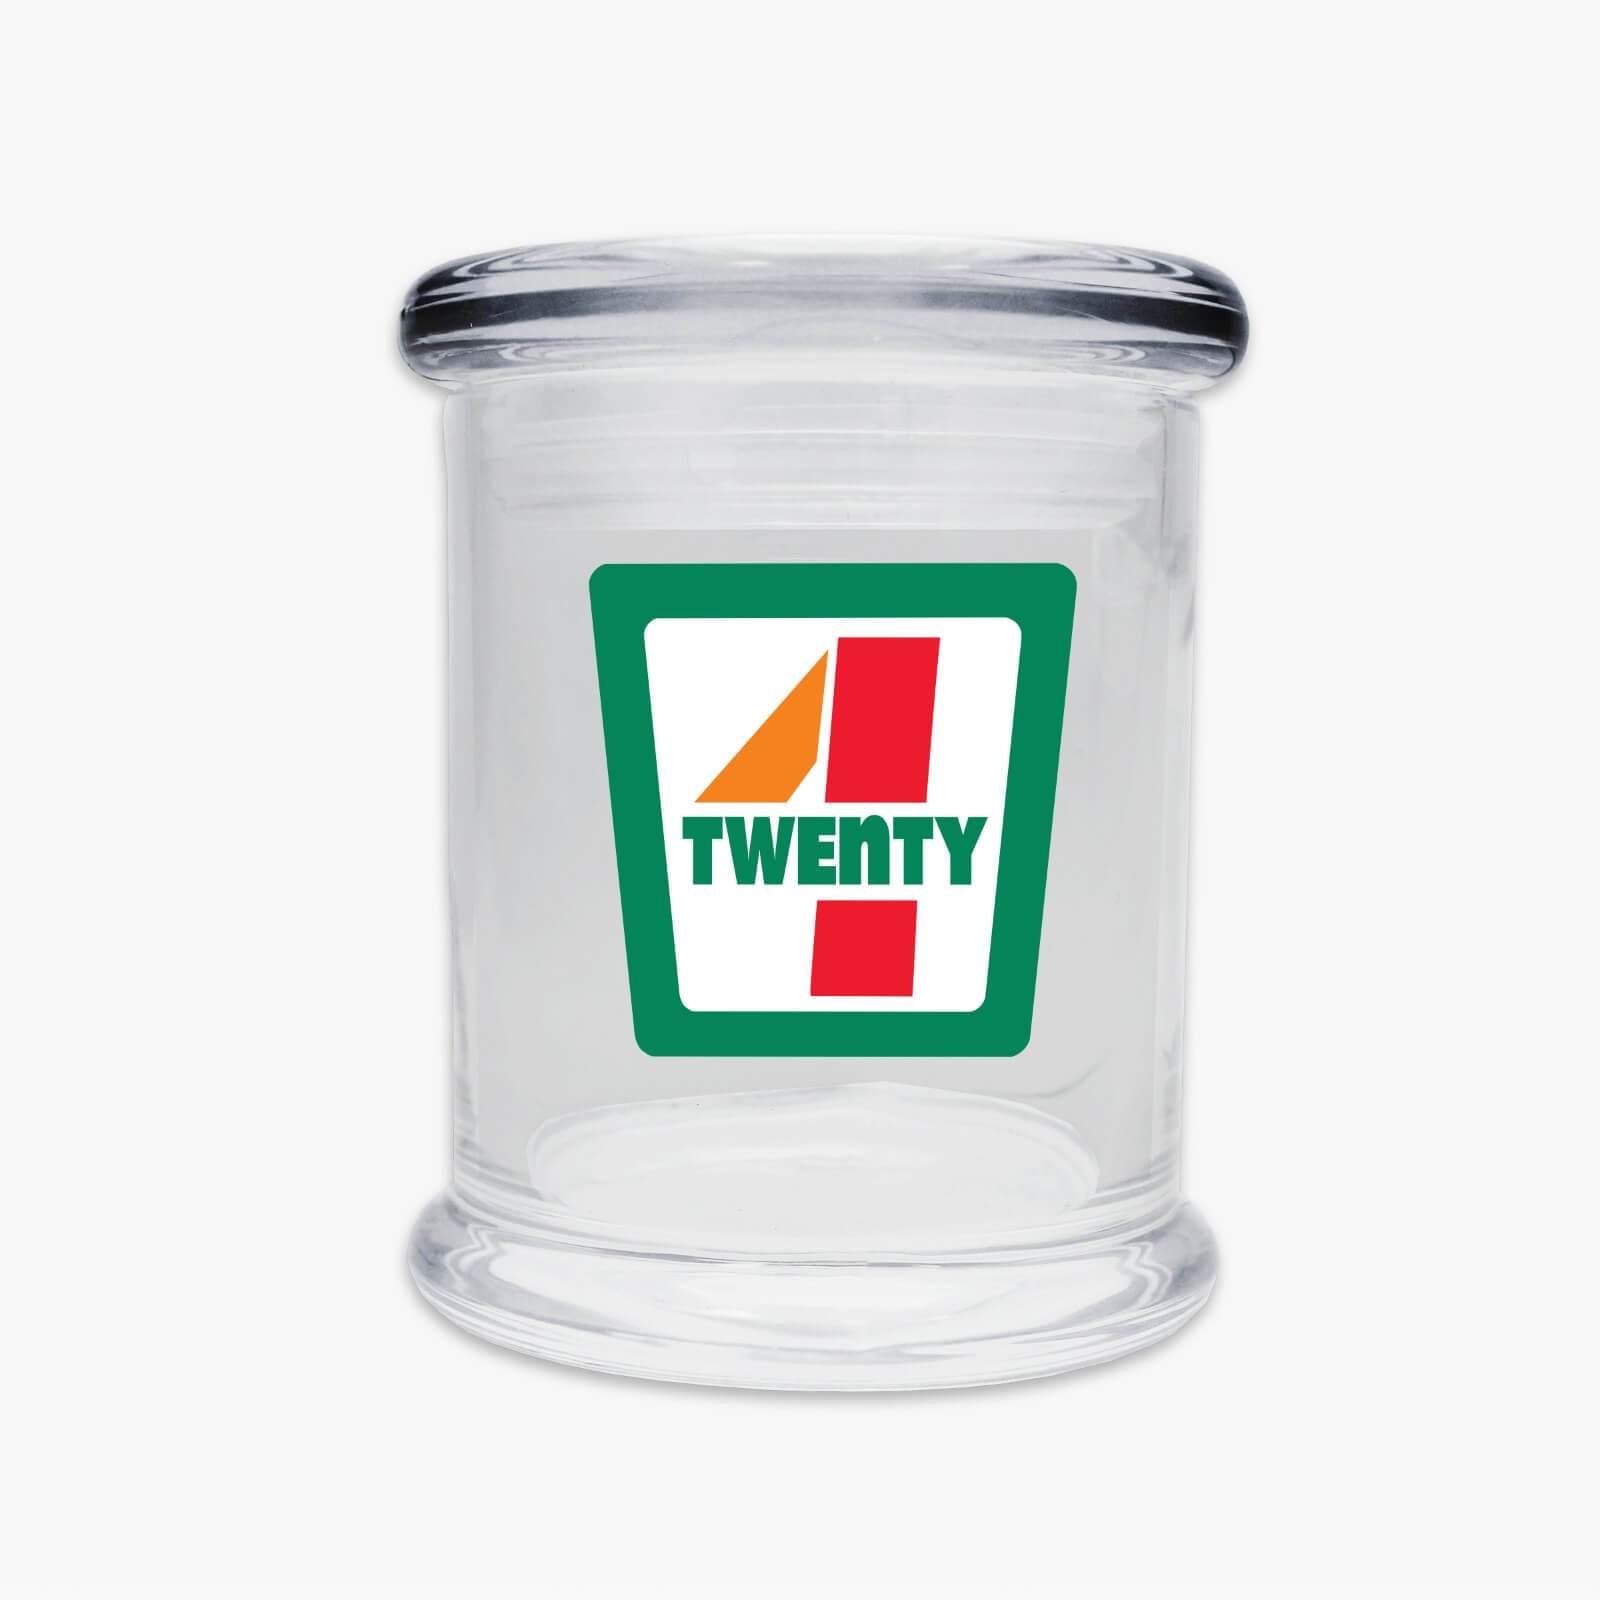 Juggz 4Twenty 420 Glass Jar